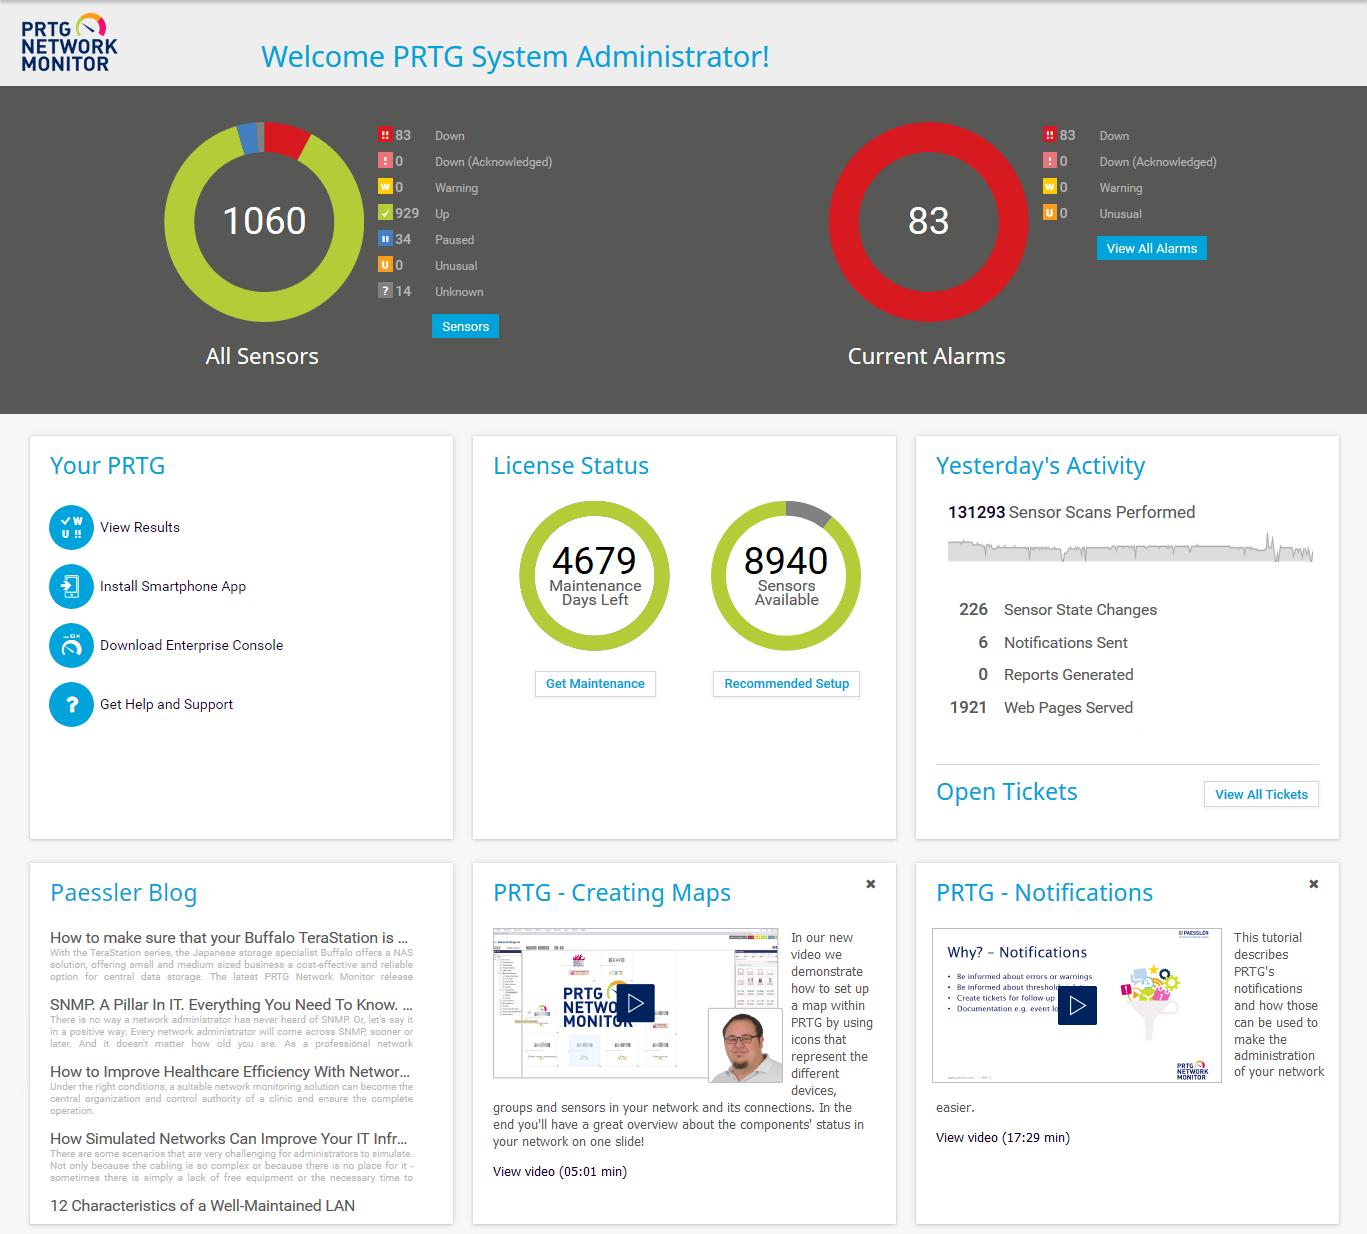 User Manual   PRTG Network Monitor (DRSA-AWS-PRTG)